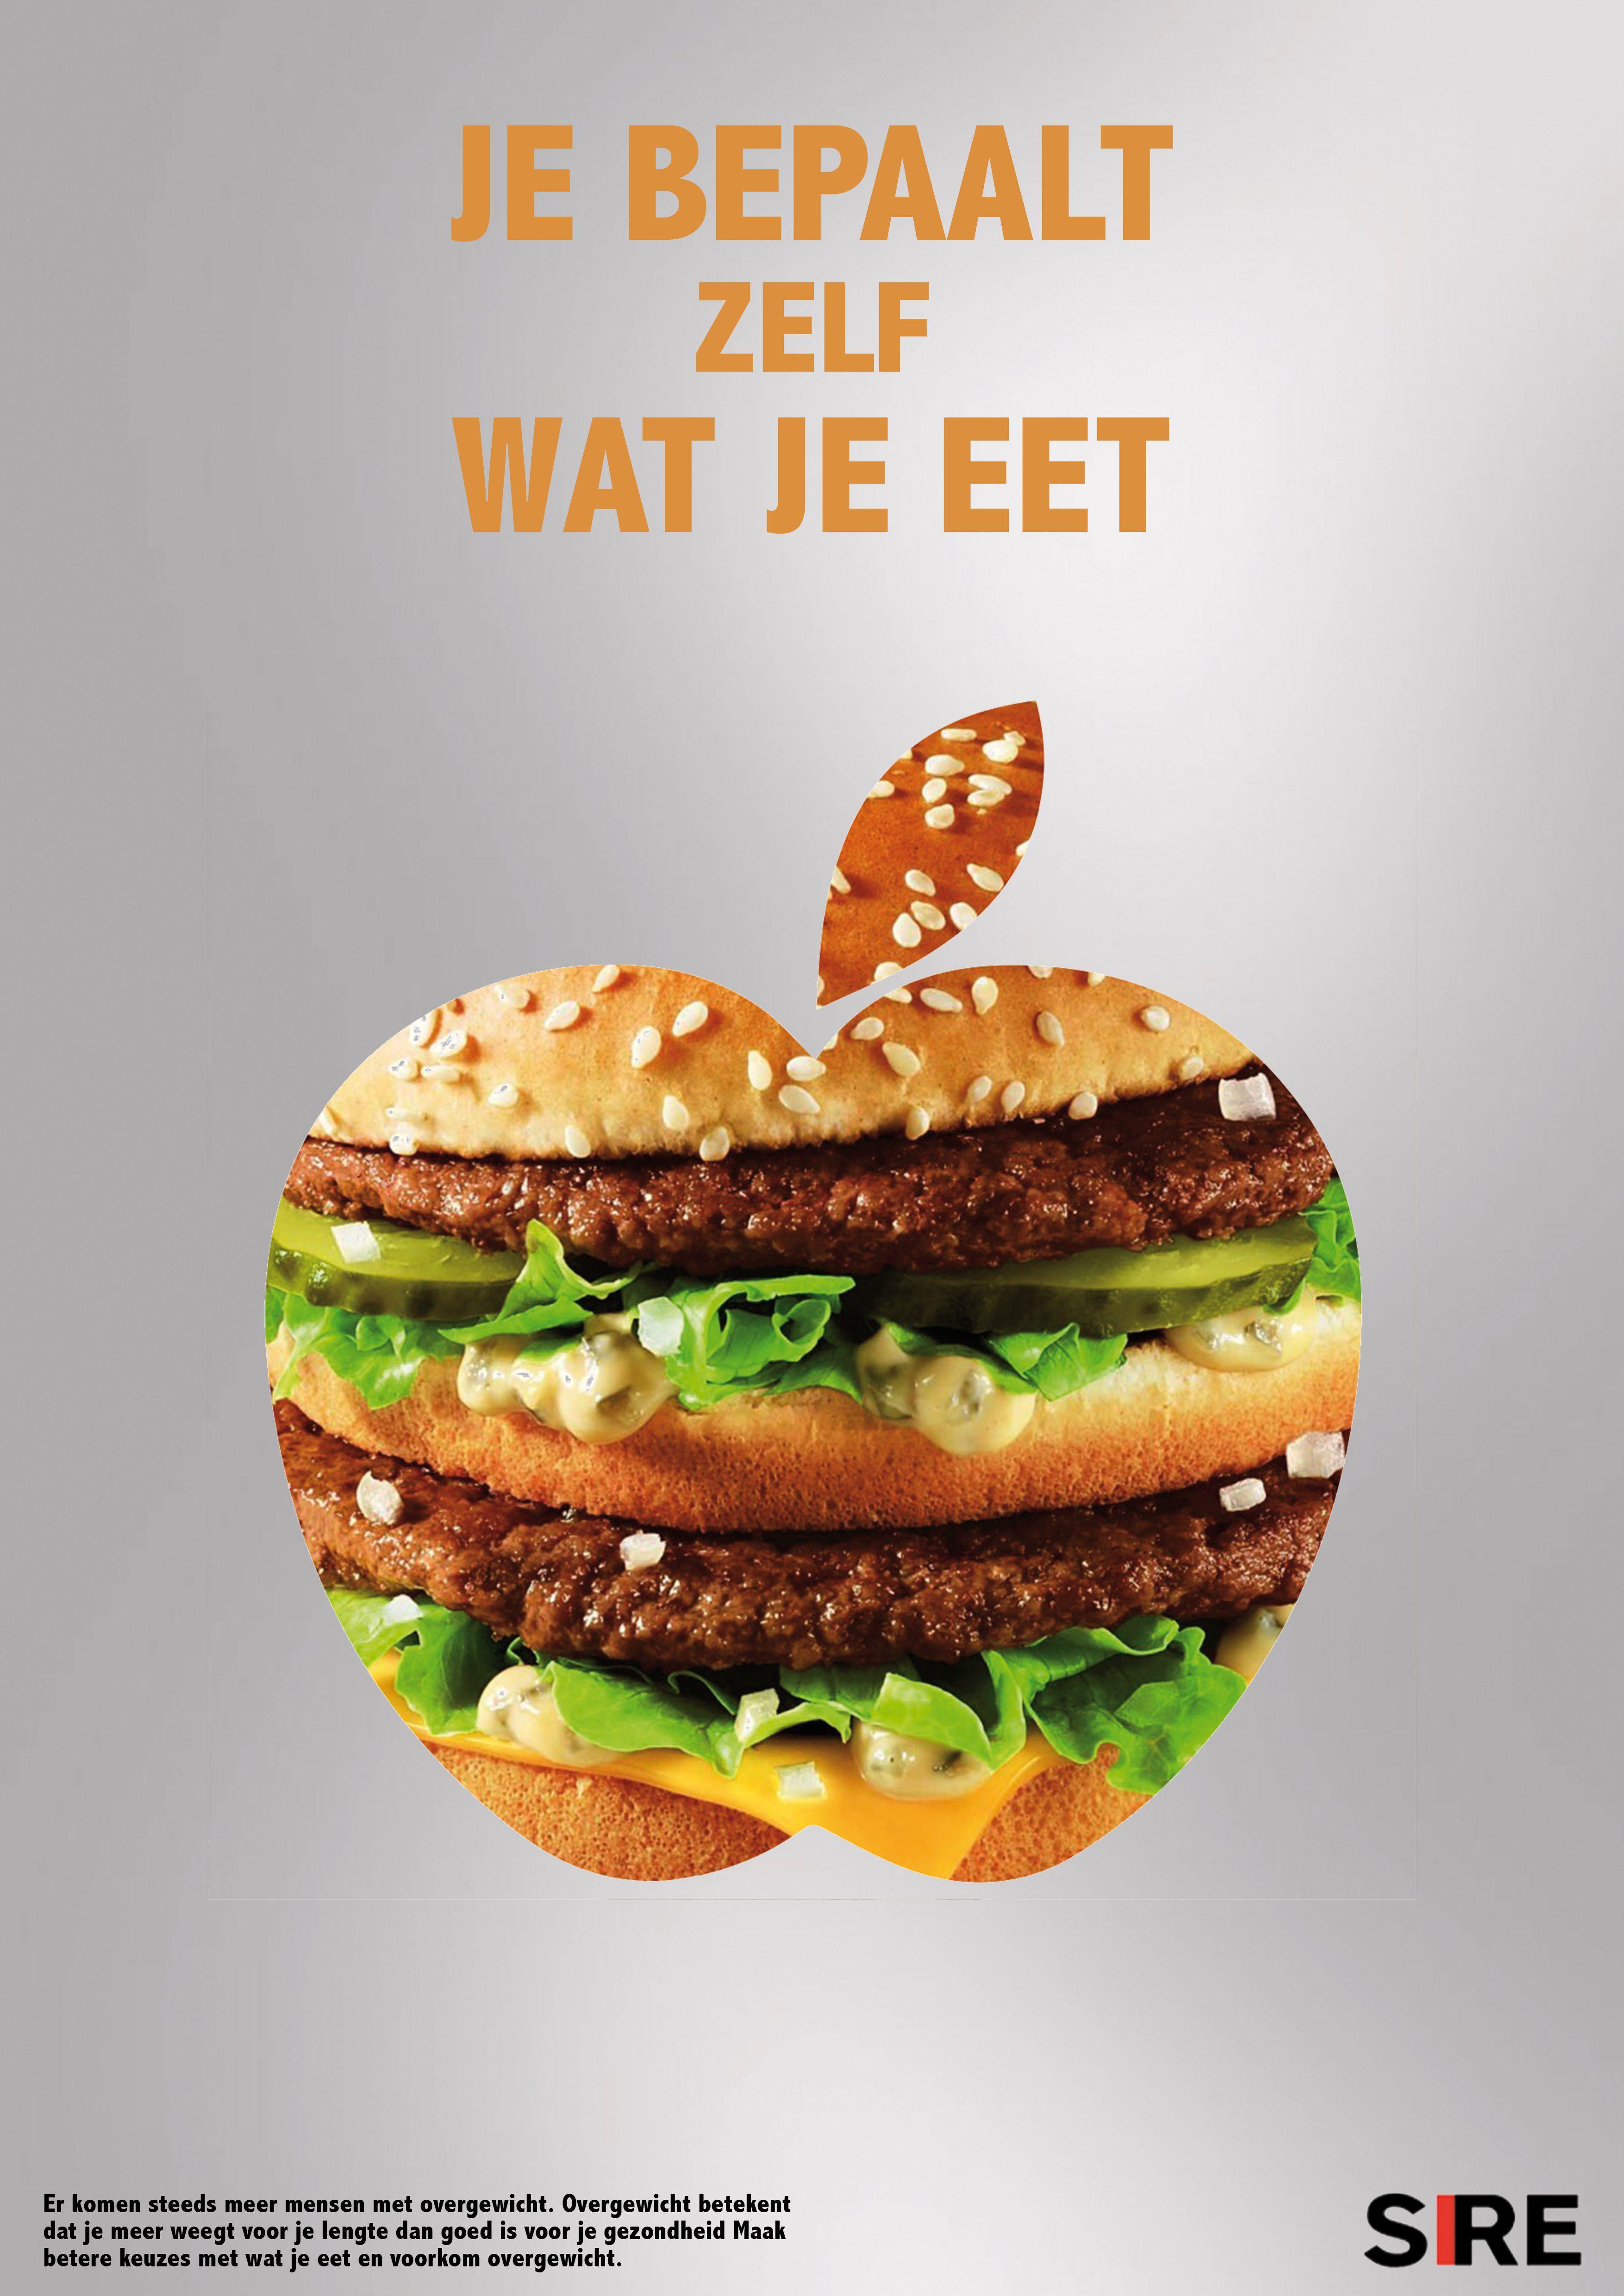 Grappige Citaten Over Eten : Poster sire overgewicht taka o eten wijsheid gezond